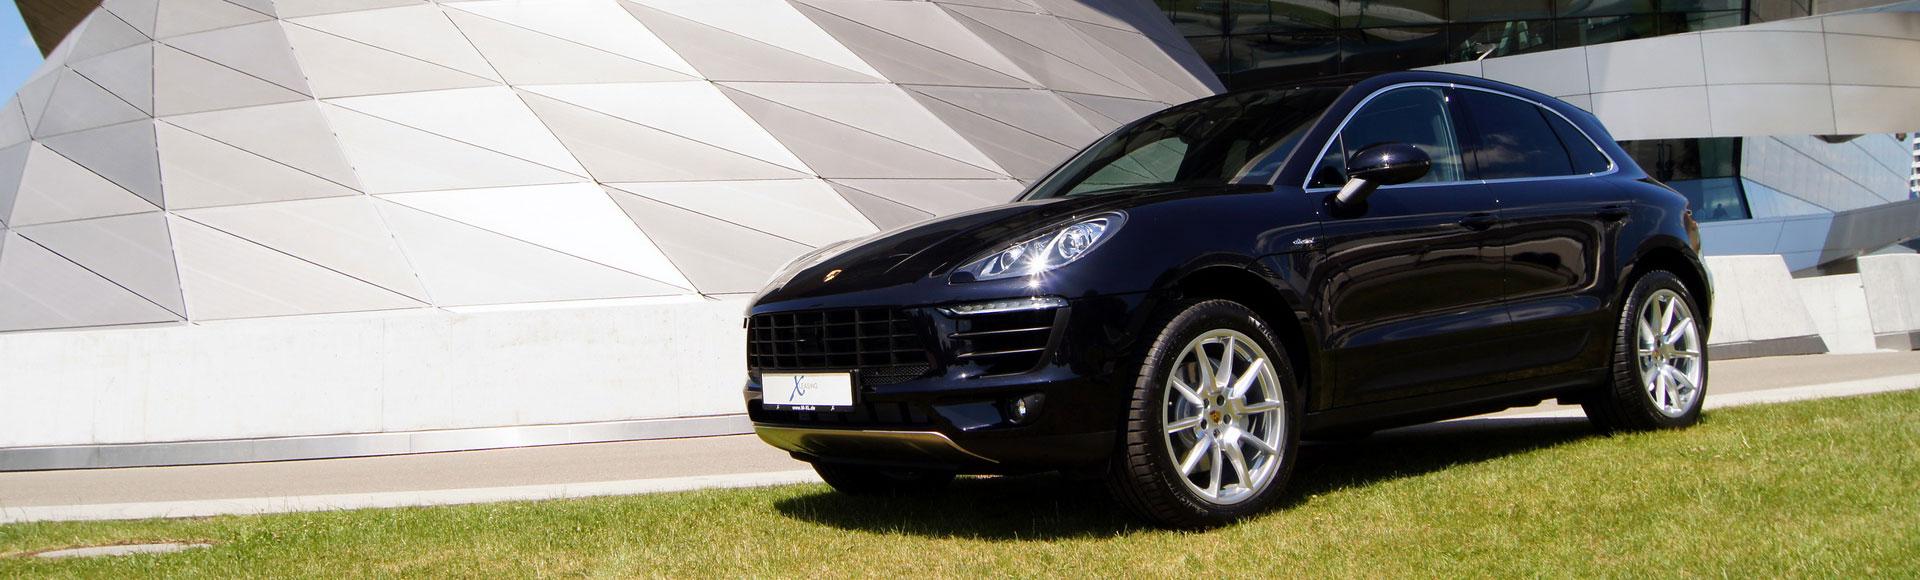 Porsche Macan 2014 Sommer 8009